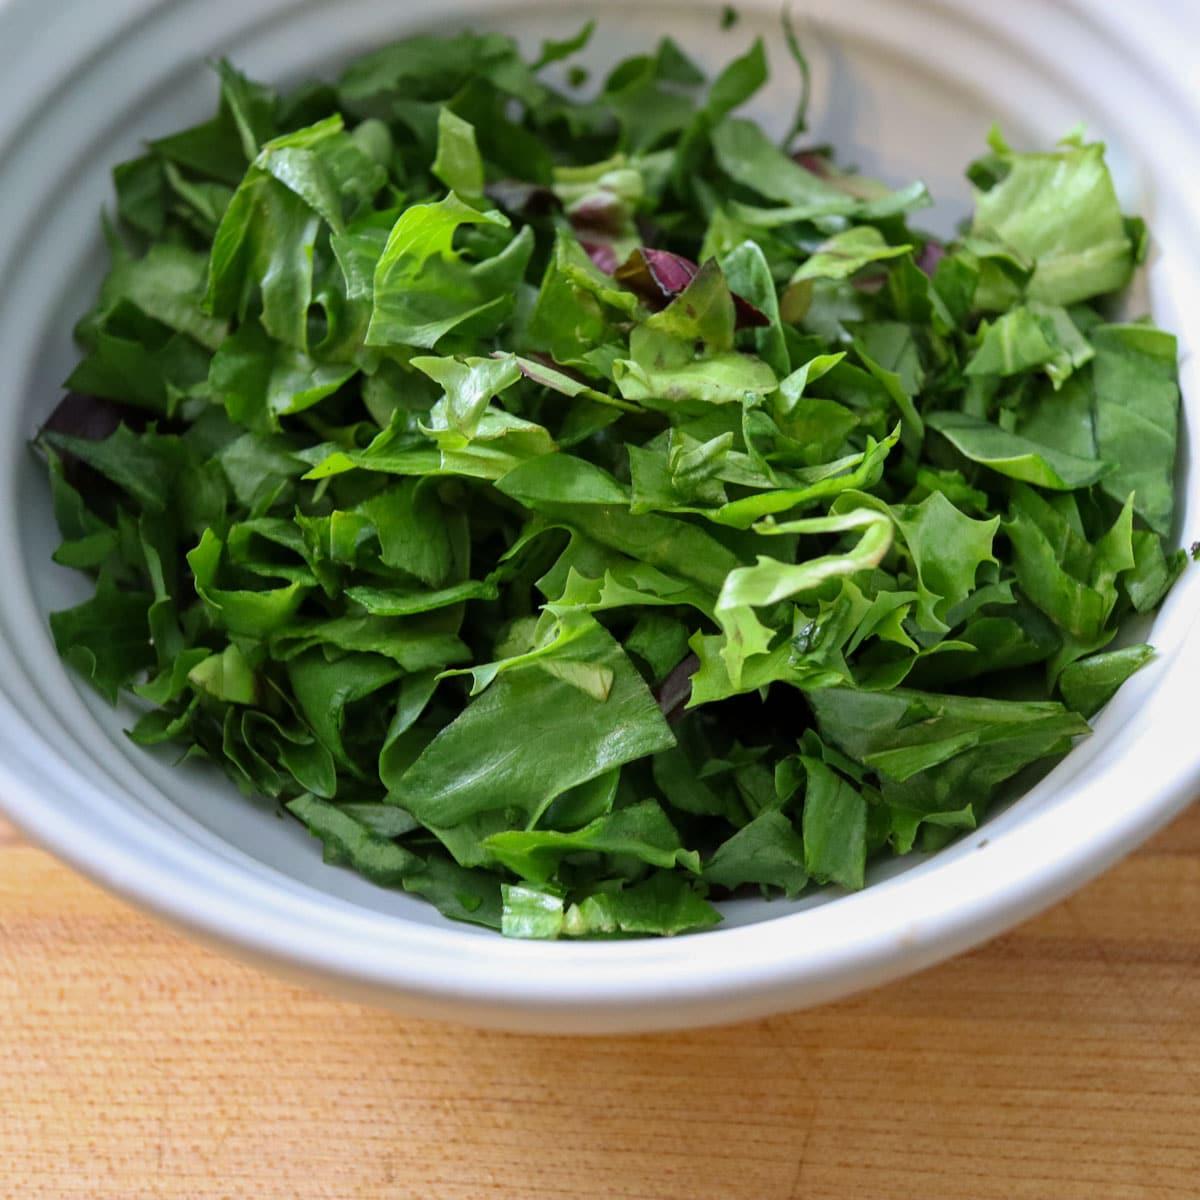 chopped green lettuce in a bowl